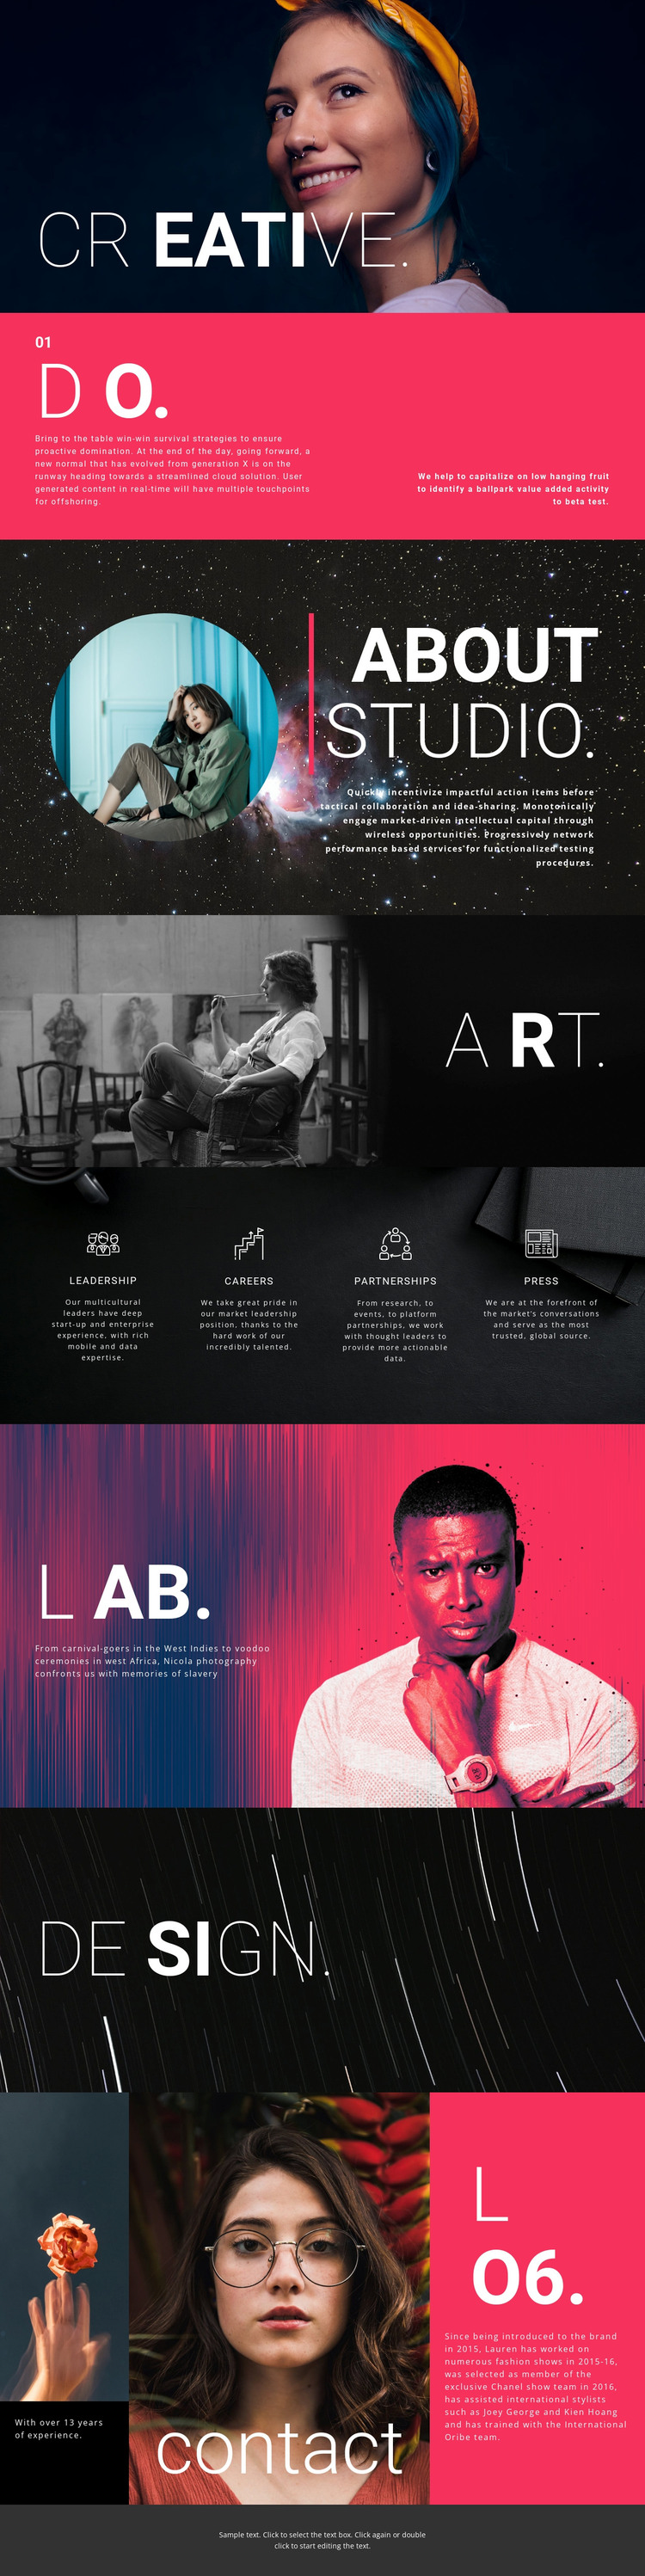 Creative design studio Web Design